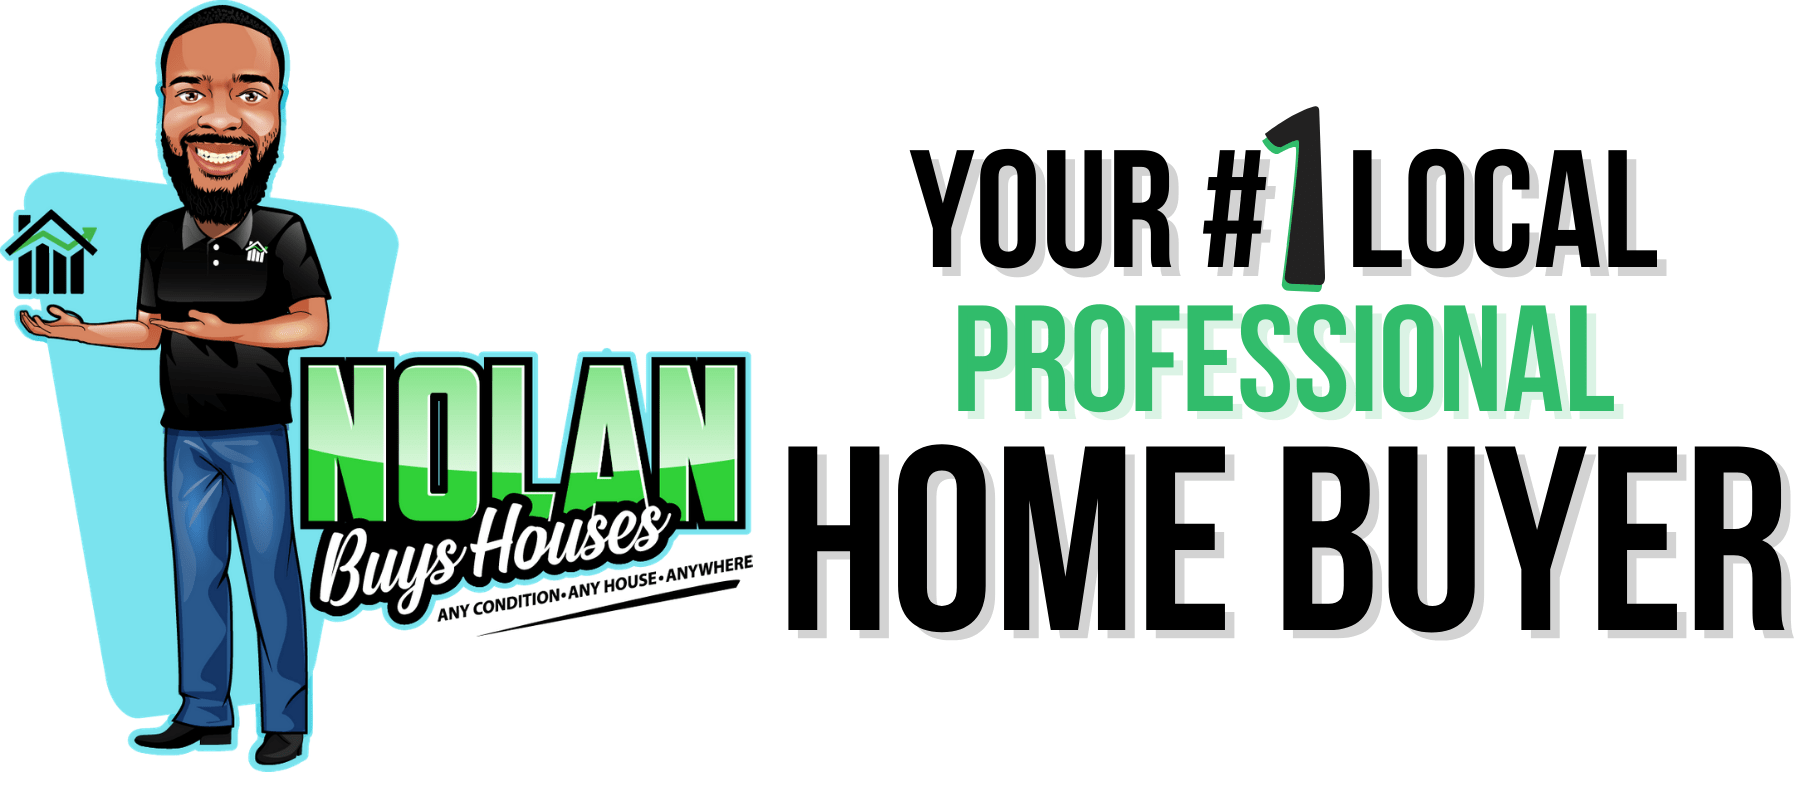 Nolan Buys Houses | Quick & Easy 4 Step Process logo